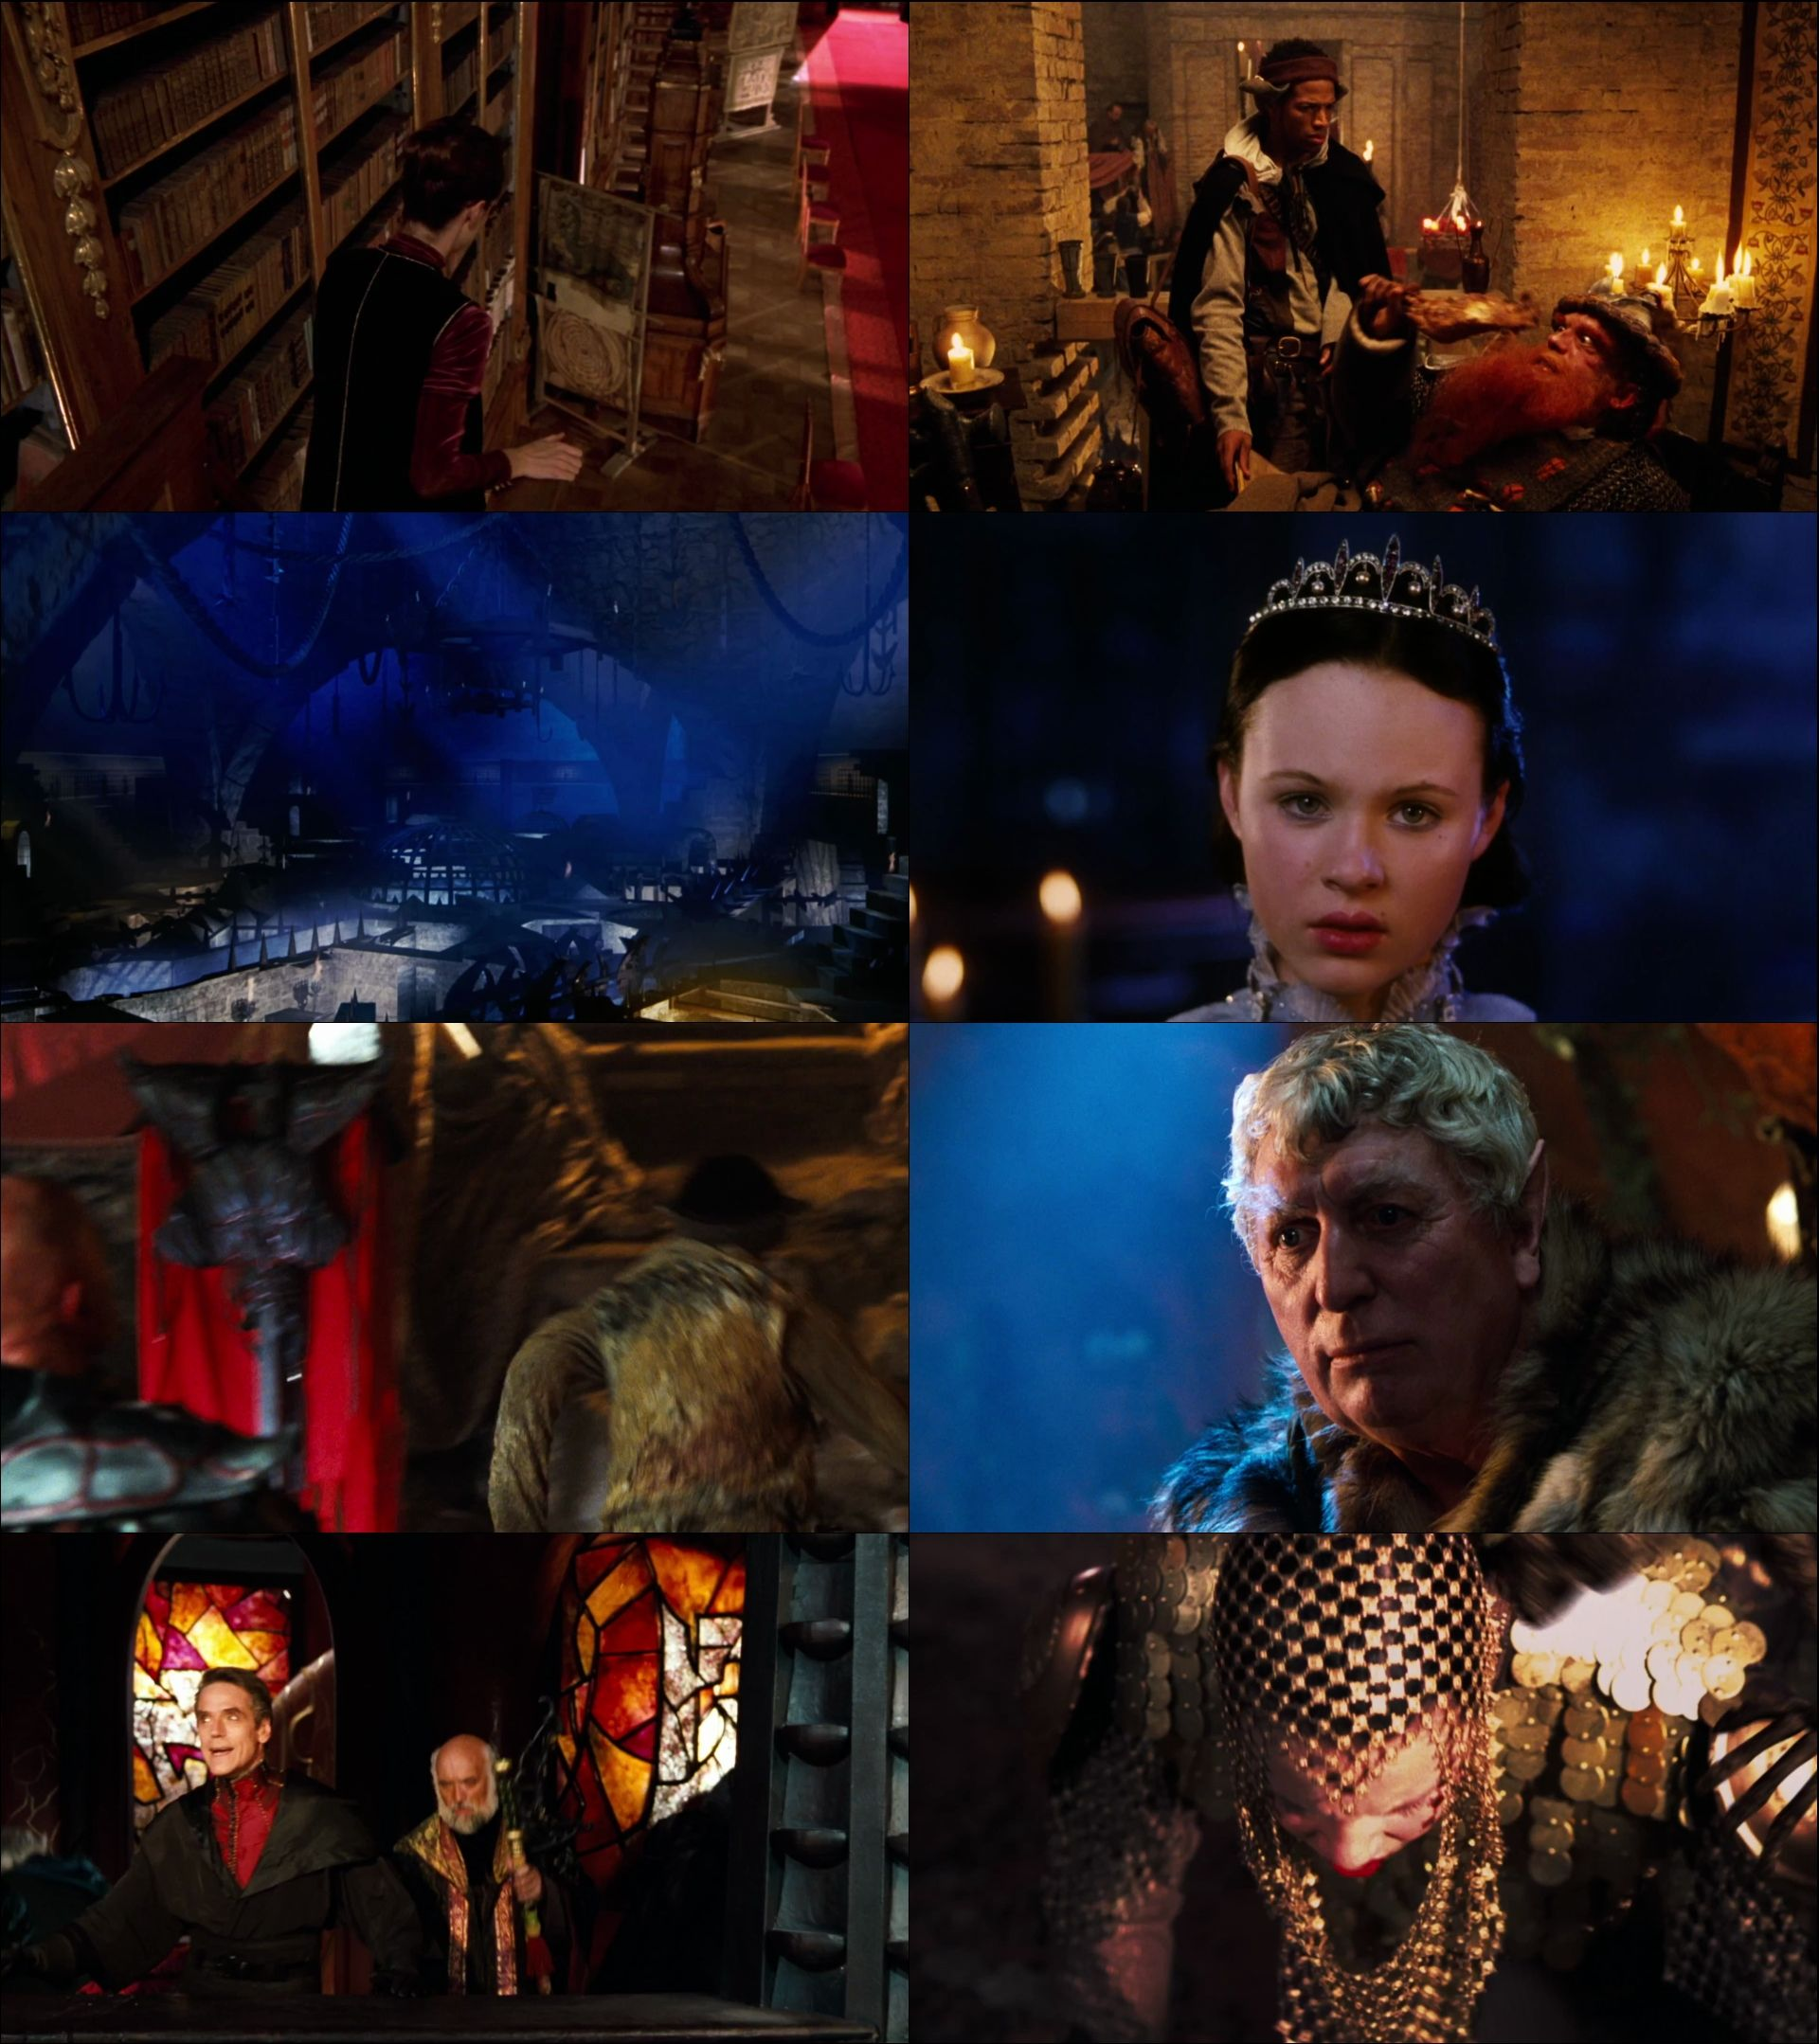 Zindan Ve Ejderha - Dungeons & Dragons (2000) türkçe dublaj film indir